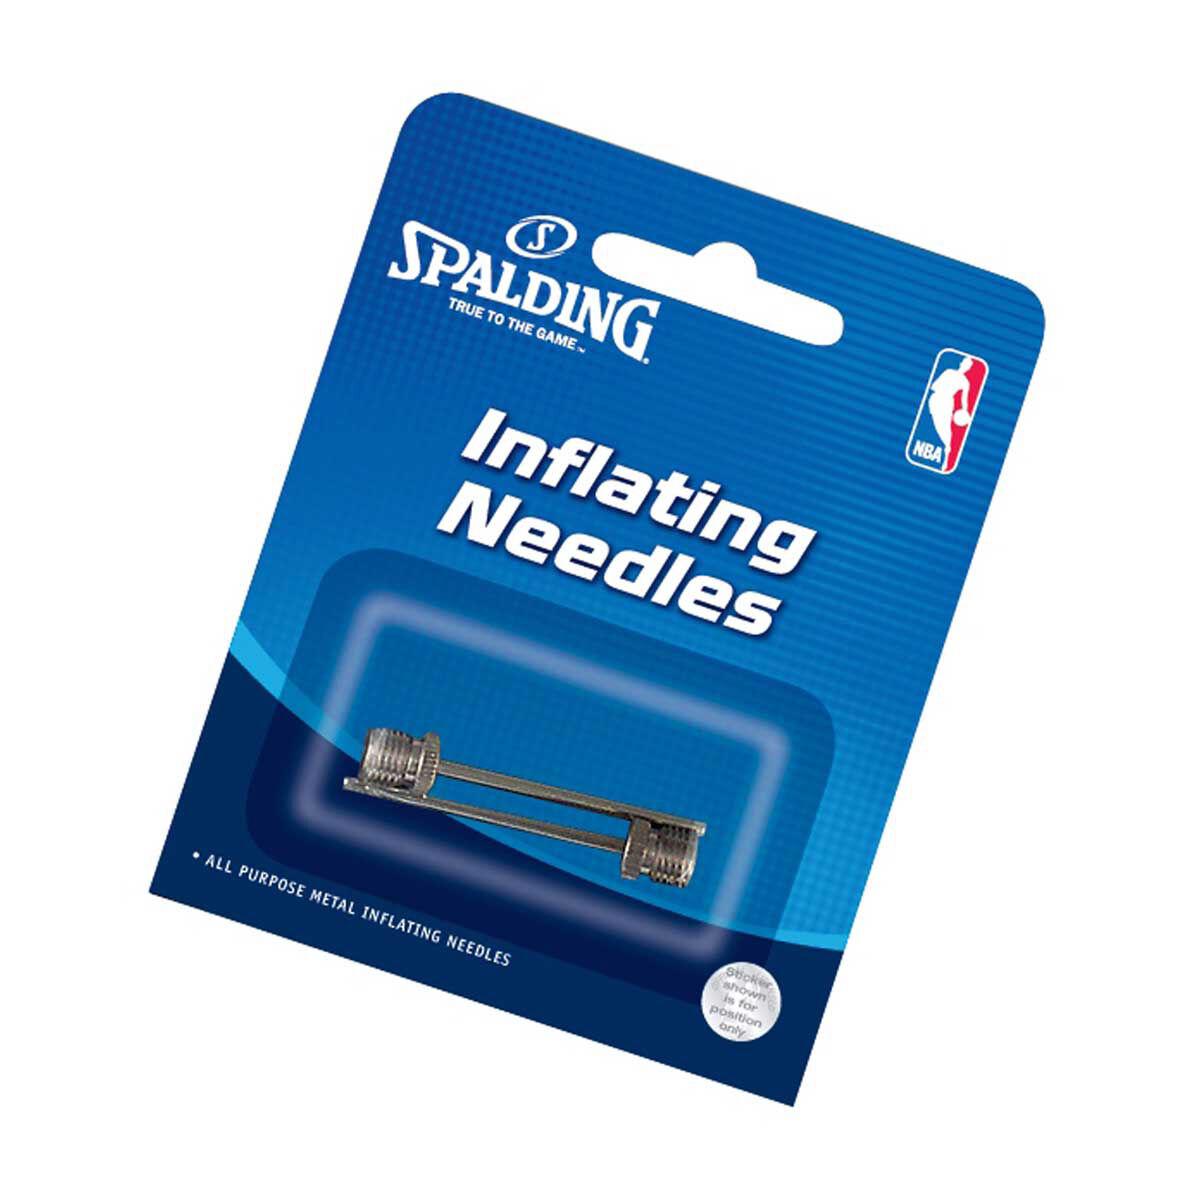 Spalding Inflating Needles